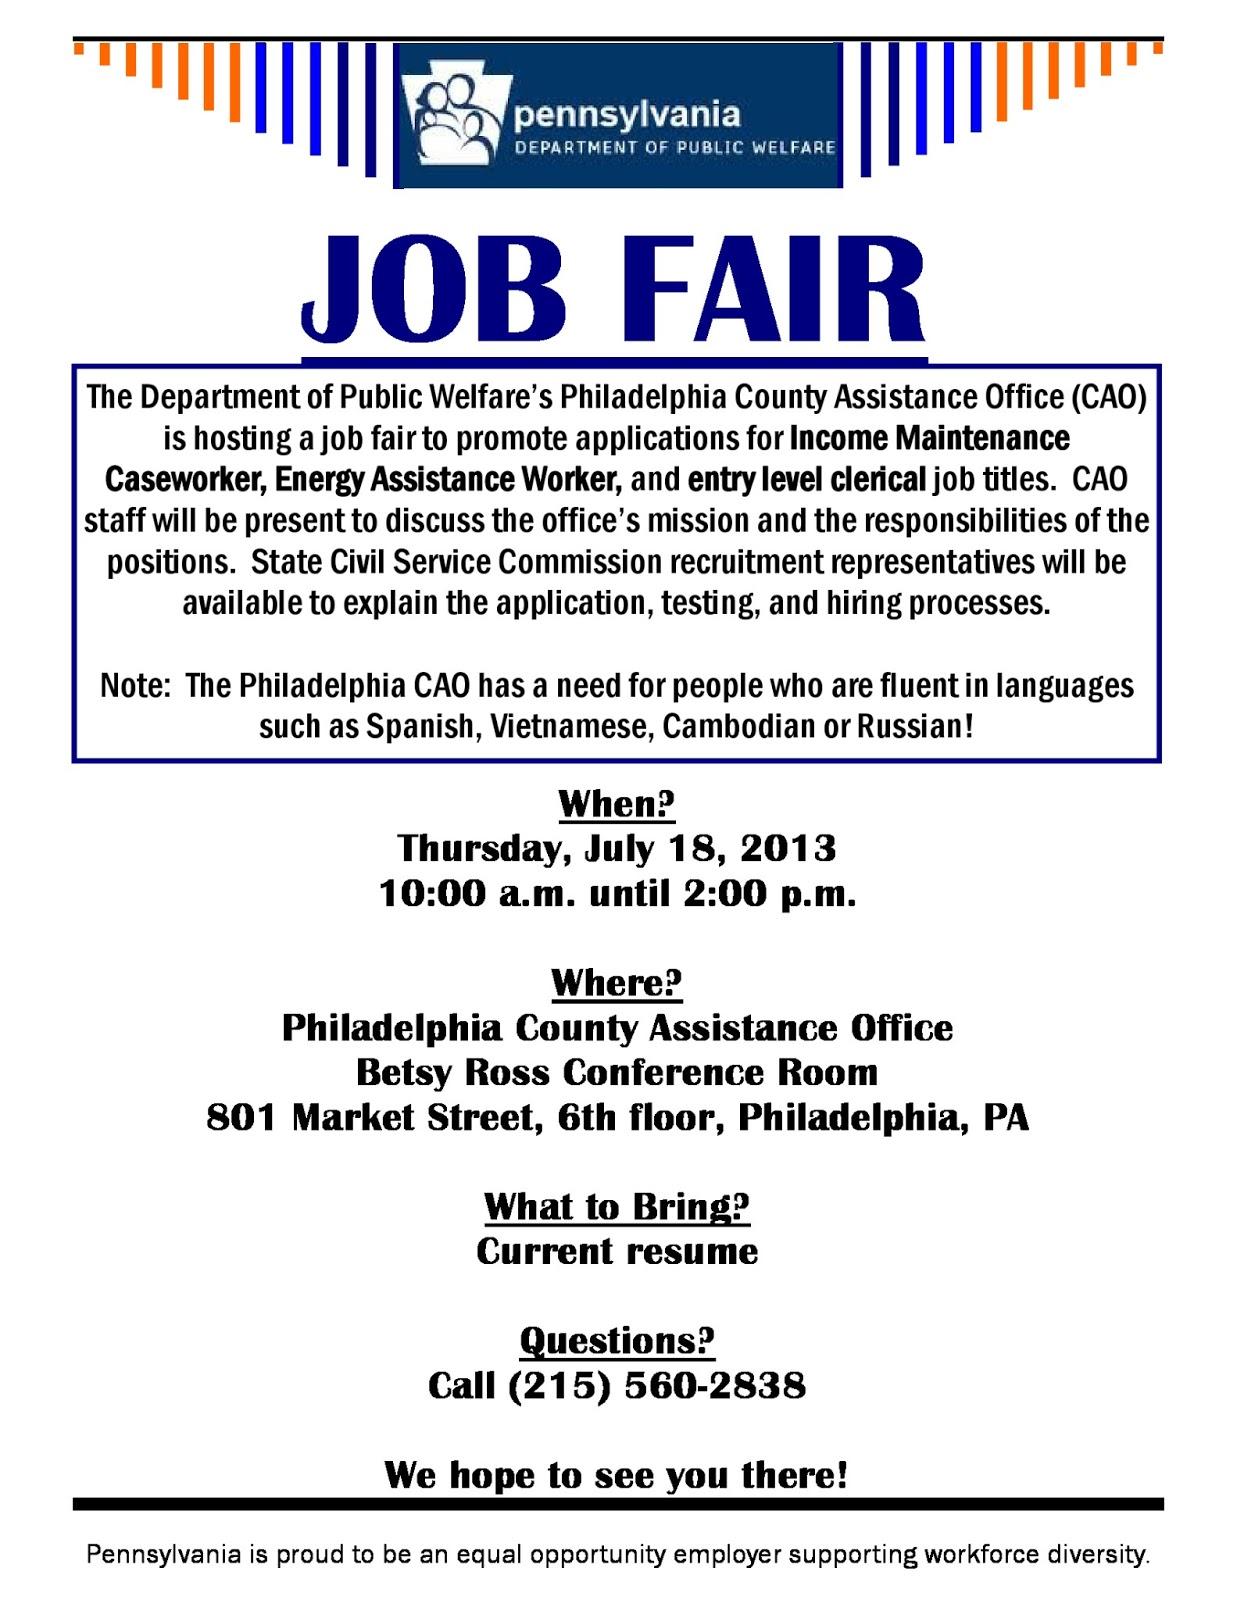 fresh start outreach ministry job fair department of public